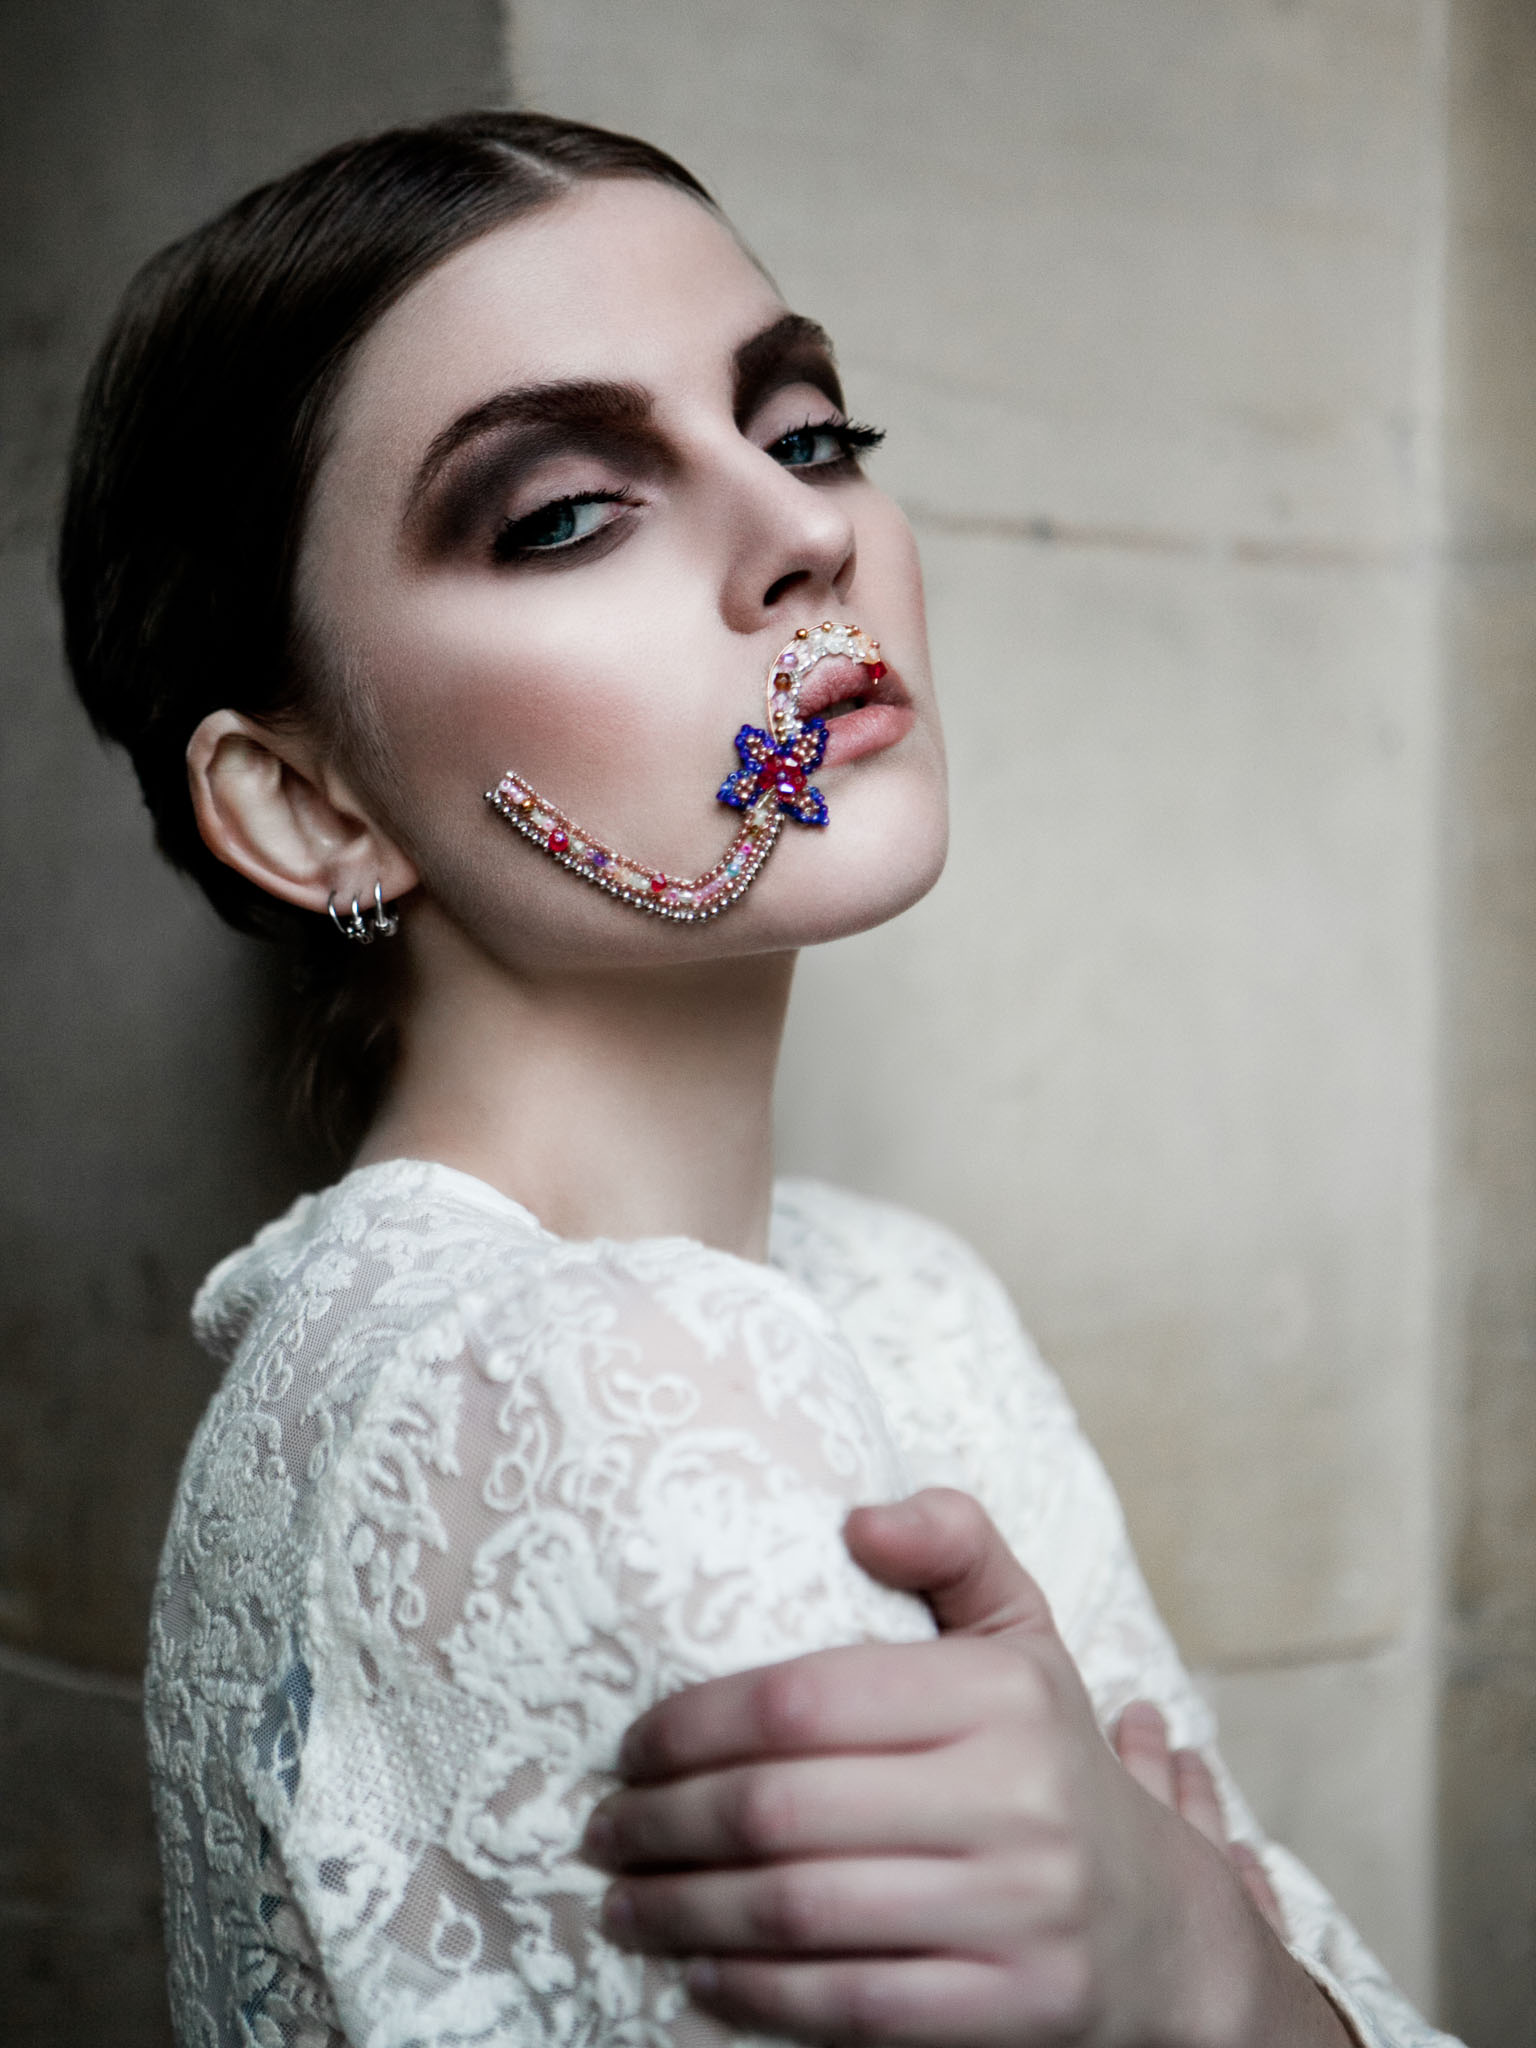 Lara-lam-rebel-fashion-editorial-27.jpg